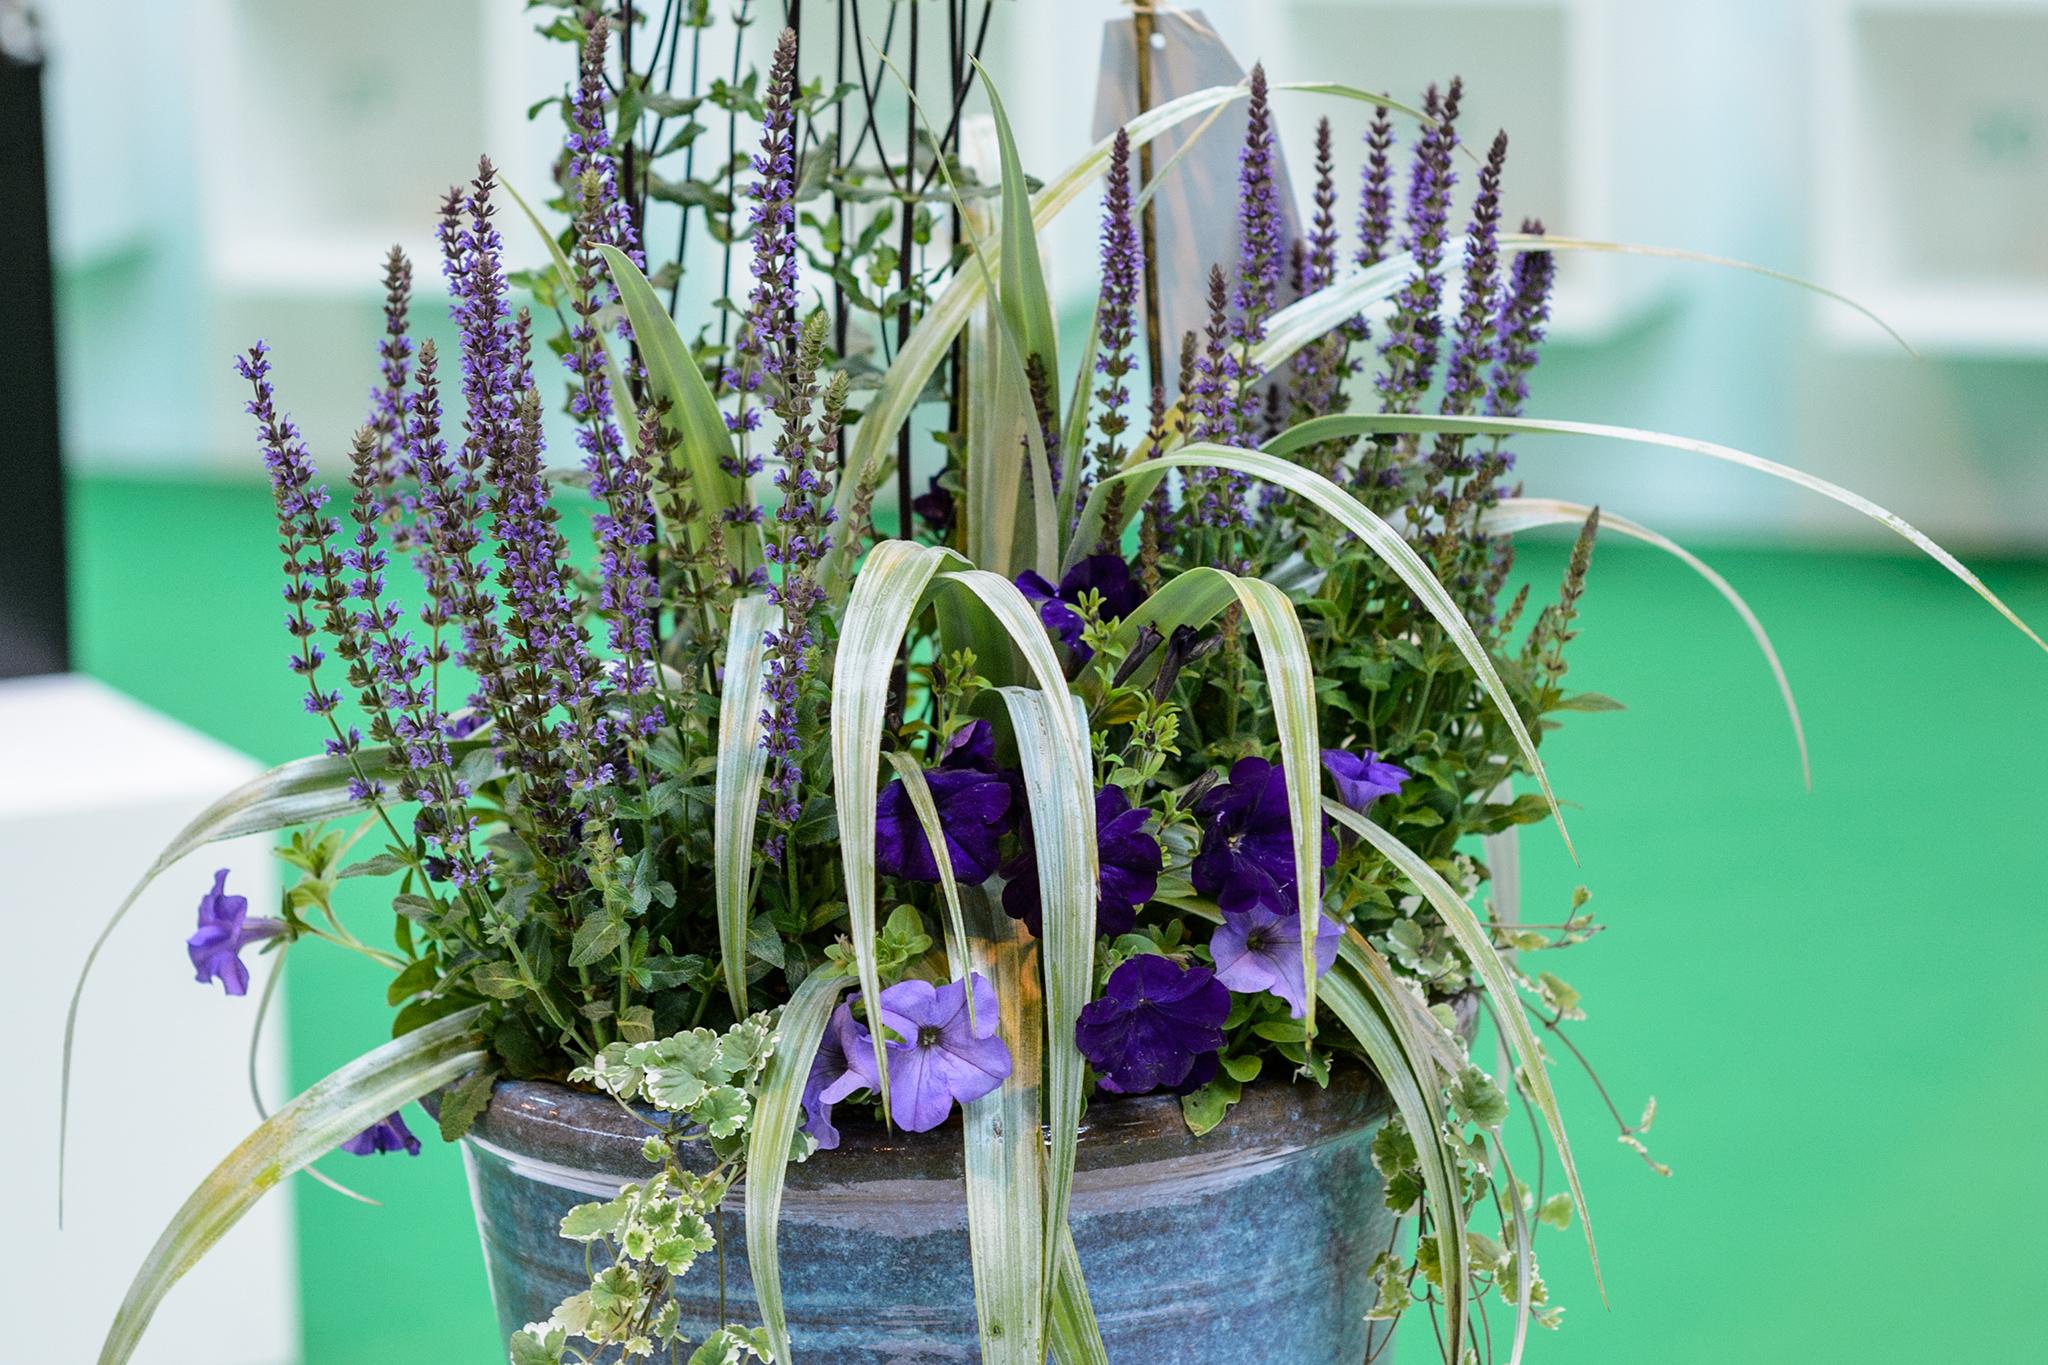 Container planted with Salvia nemerosa, Salvia caradonna, purple petunia, Astelia and Glecoma hederacea